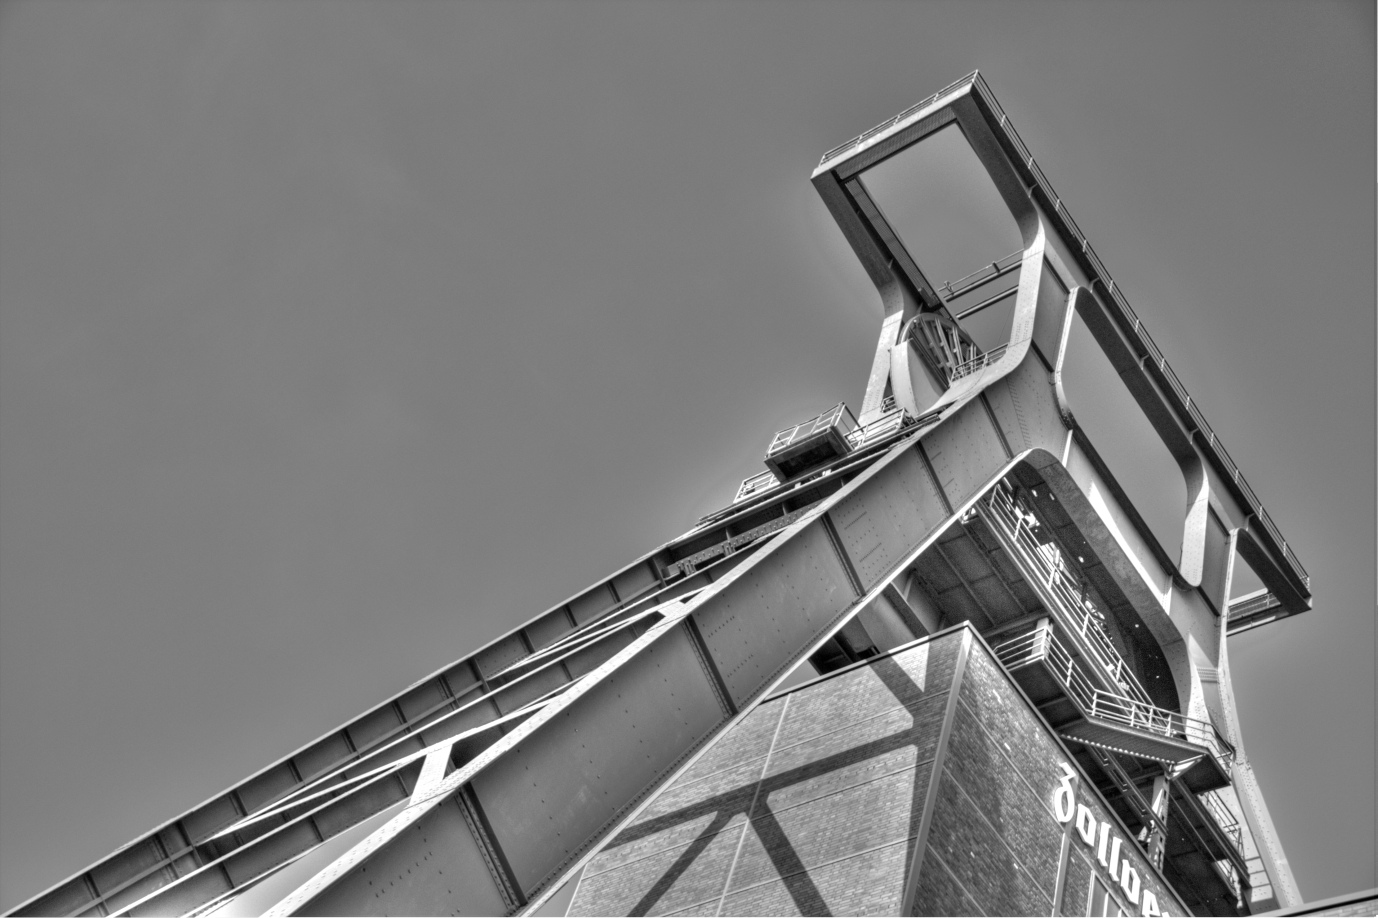 Förderturm Zollverein, D-Essen